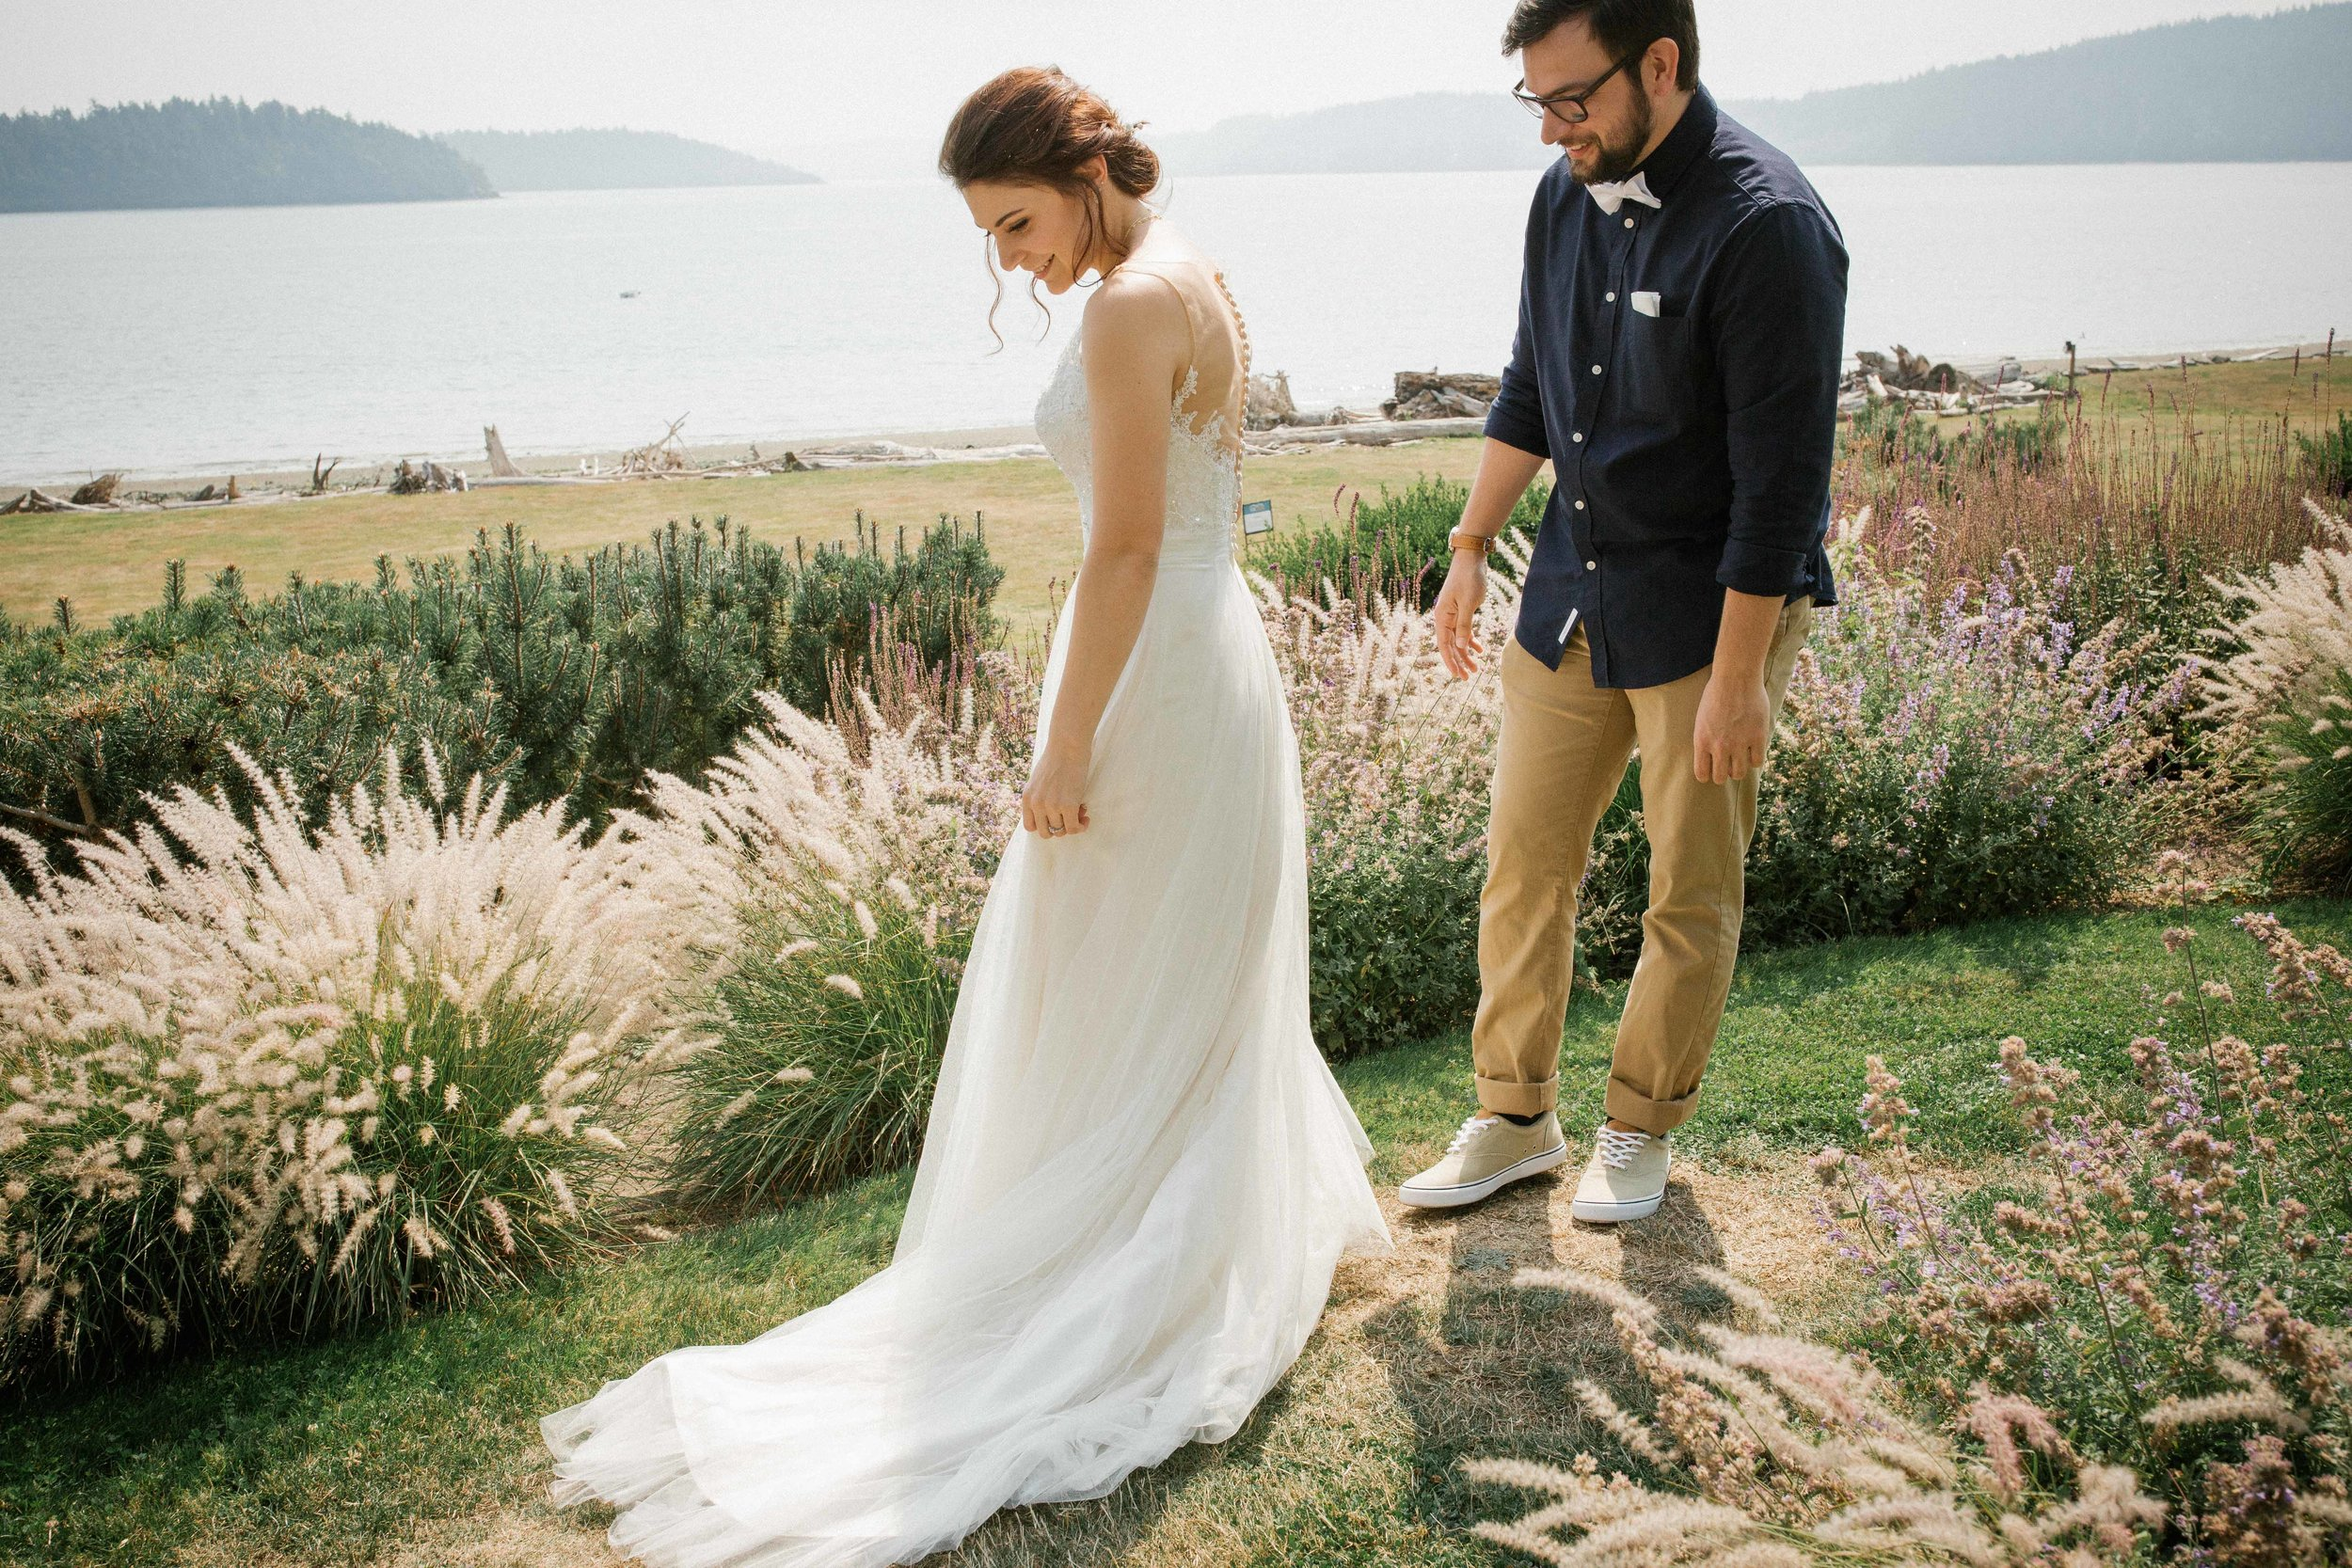 deception-pass-wedding-21.jpg